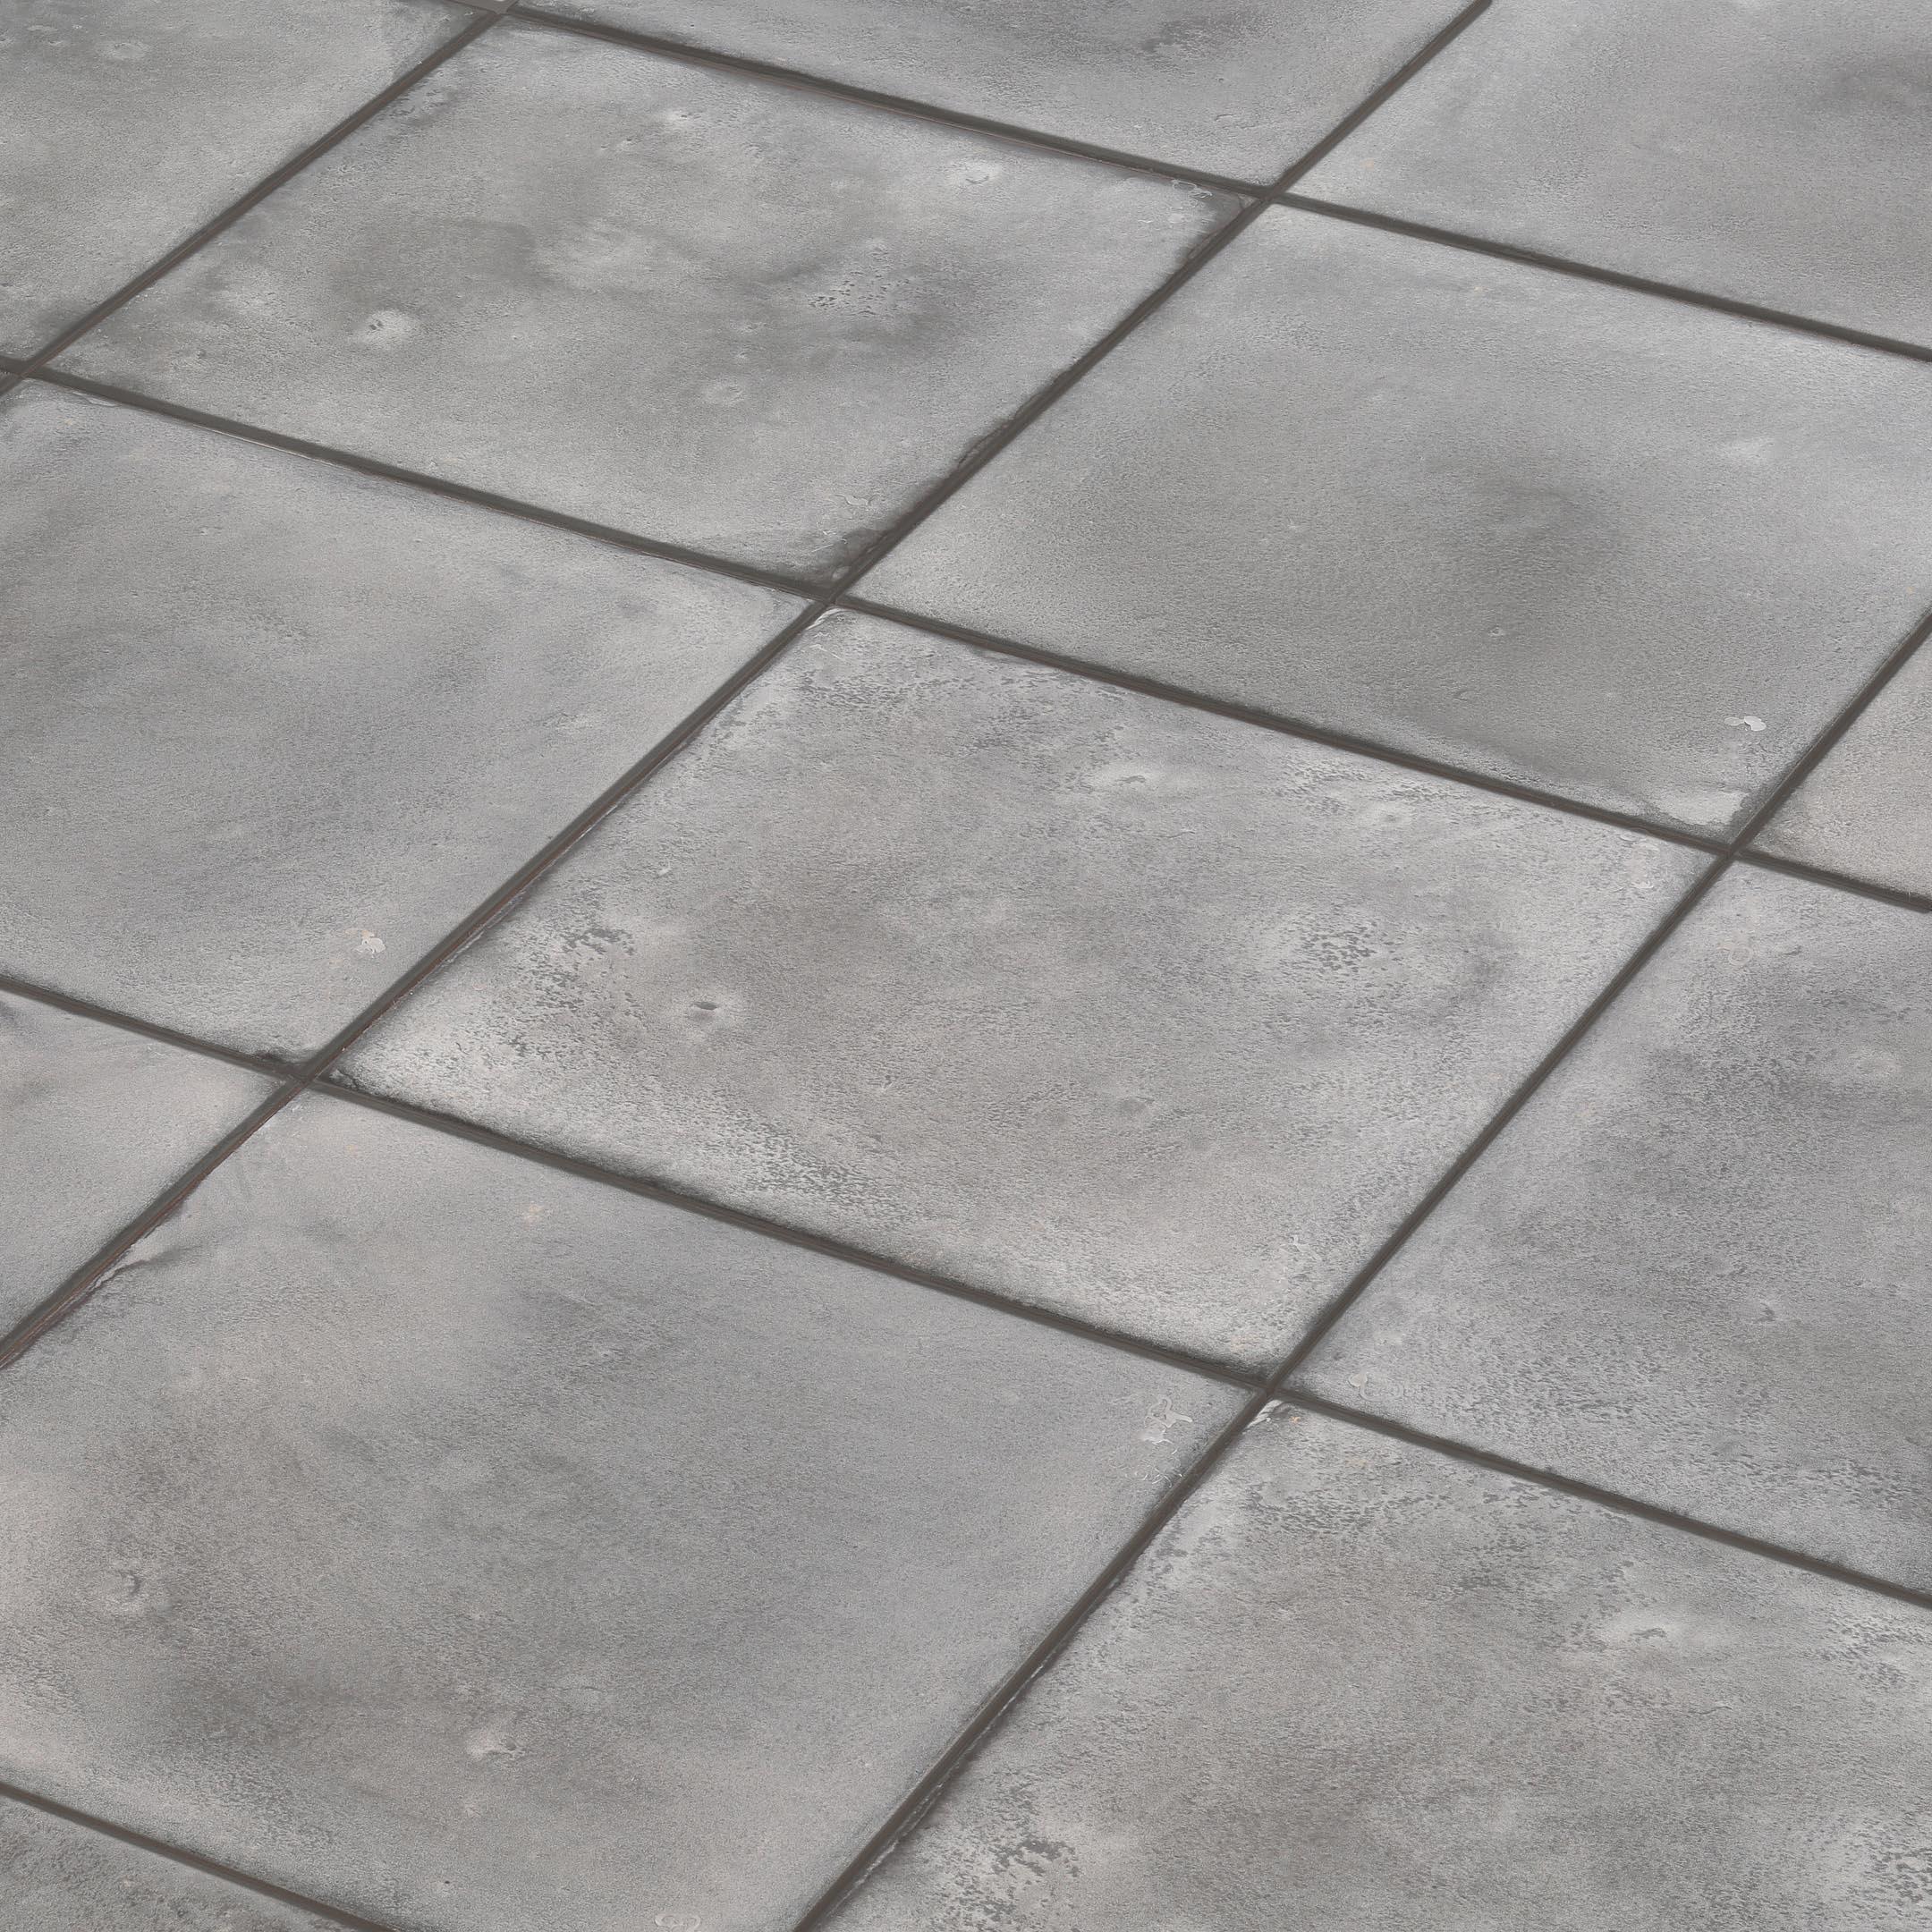 Плитка облицовочная Керамин Гранада 1Т серый 200x200x7 мм (26 шт.=1,04 кв.м) плитка облицовочная керамин гранада 1с серый 200x200x7 мм 26 шт 1 04 кв м